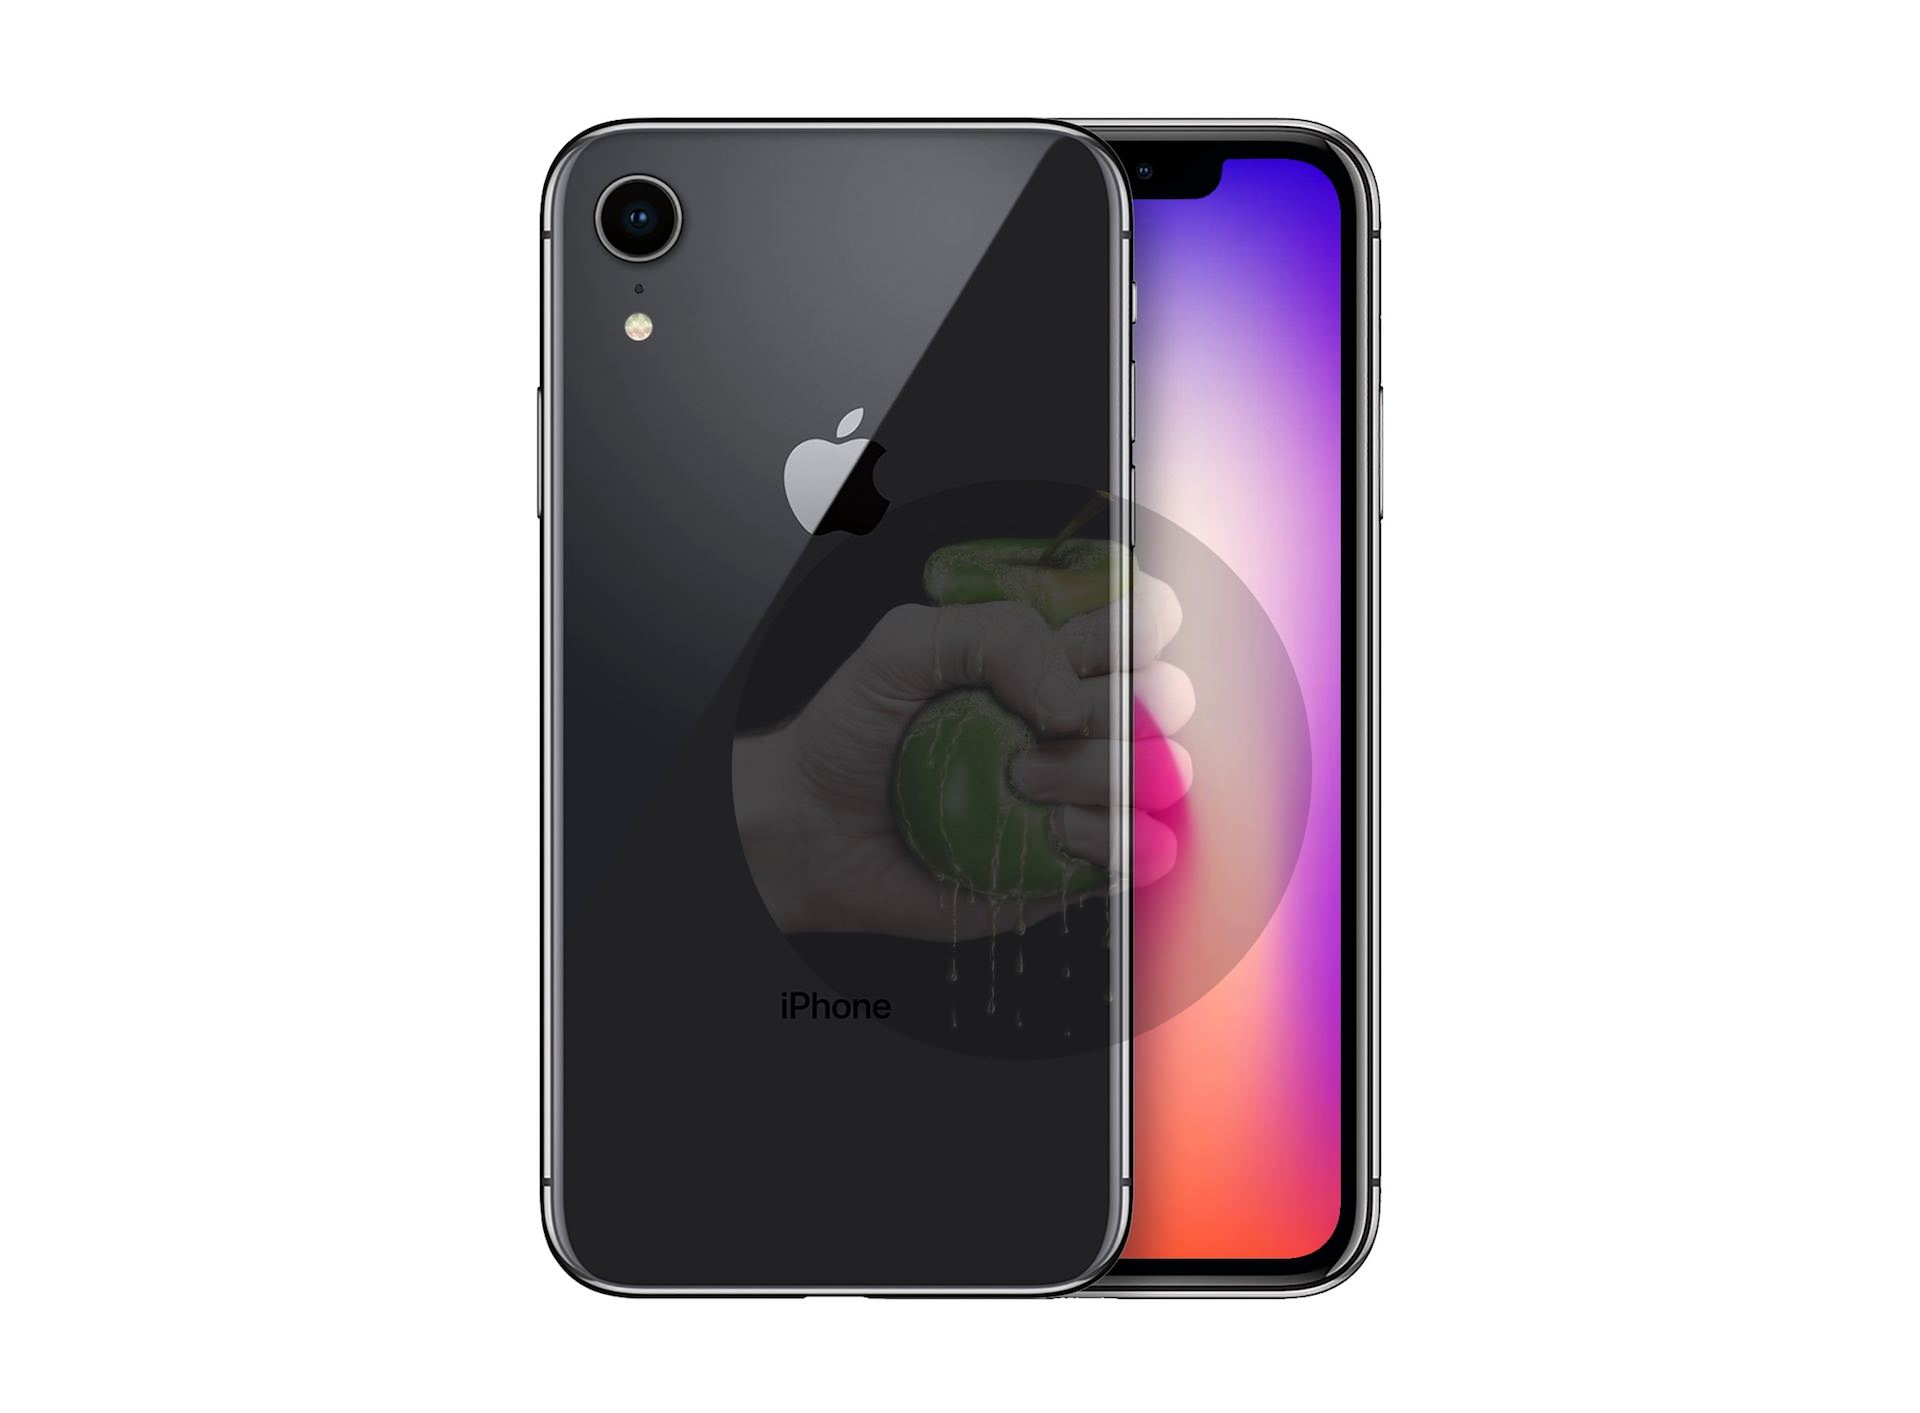 iPhone-9-wylsacom-6